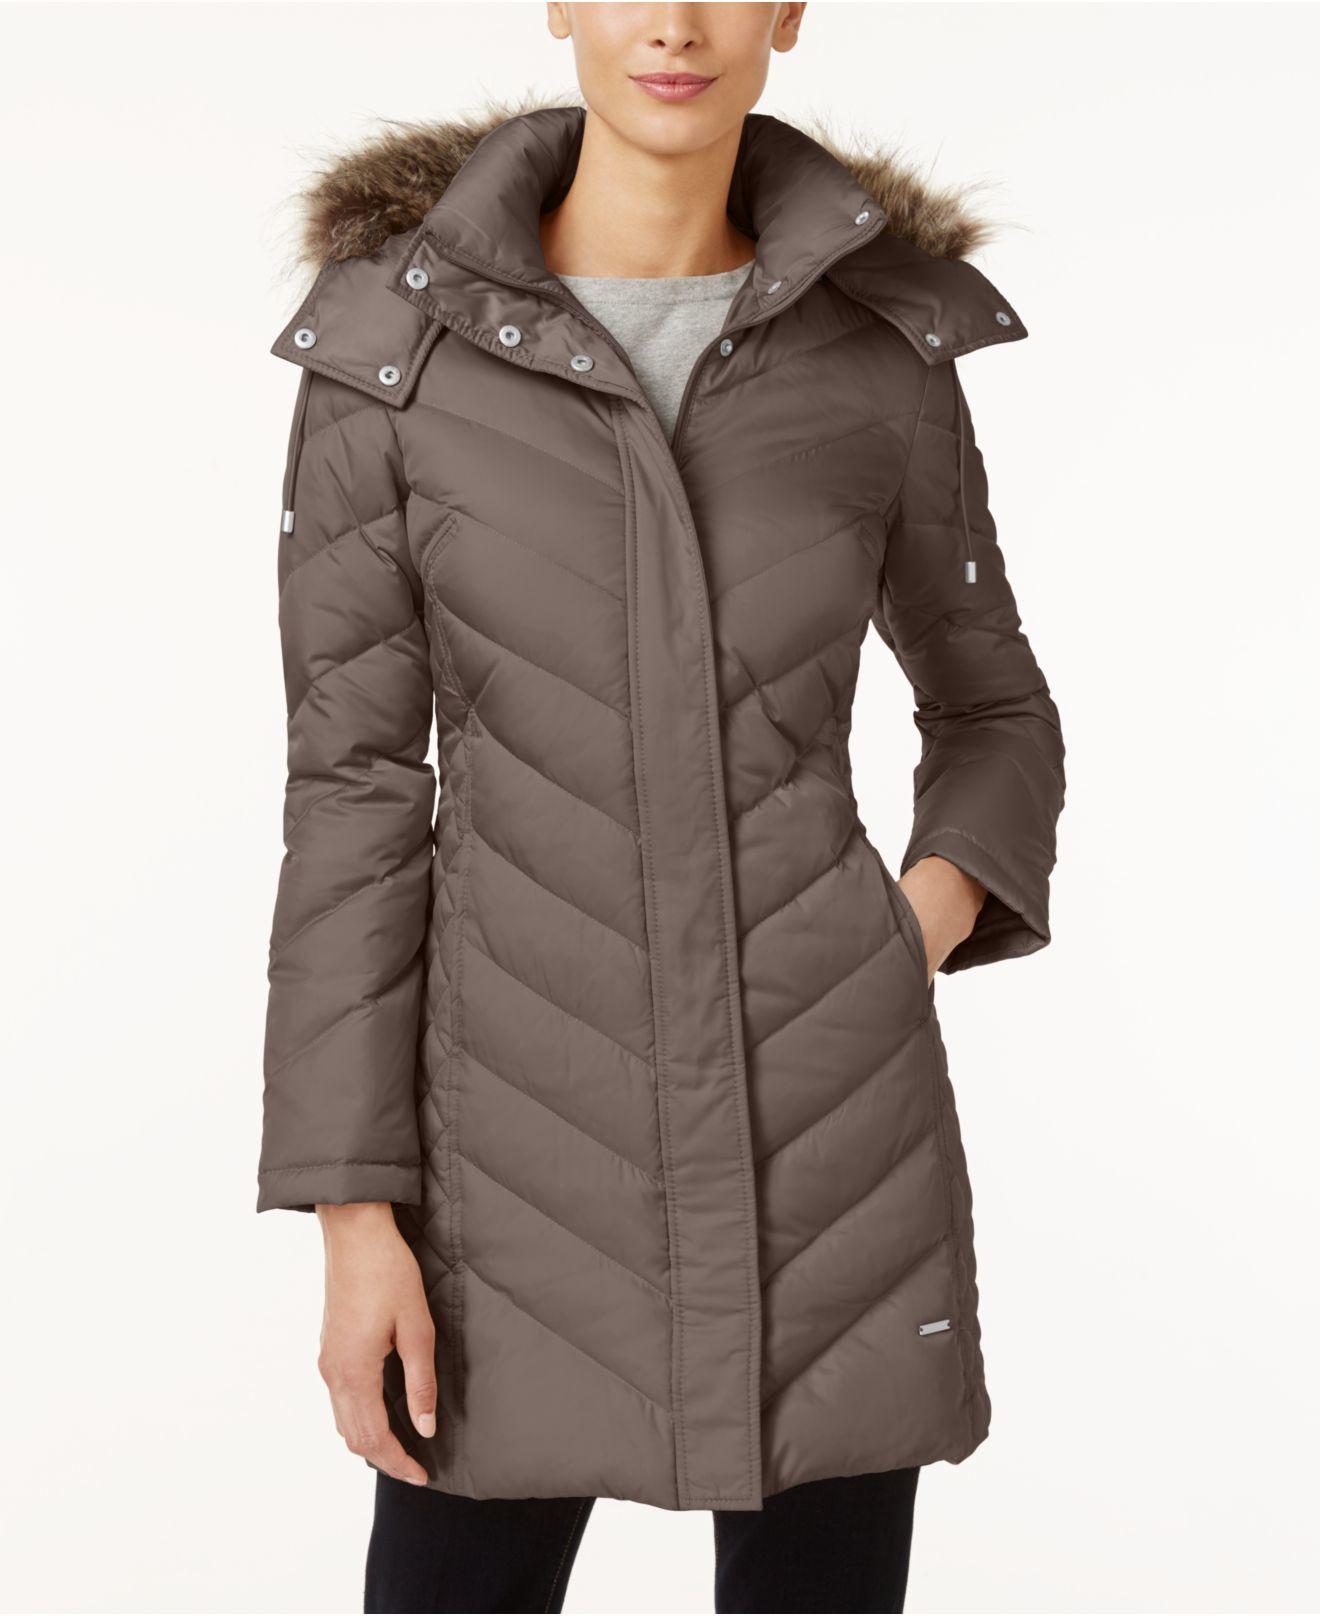 Kenneth cole Faux-Fur-Trim Chevron Quilted Down Coat in Brown ... : kenneth cole chevron quilted coat - Adamdwight.com